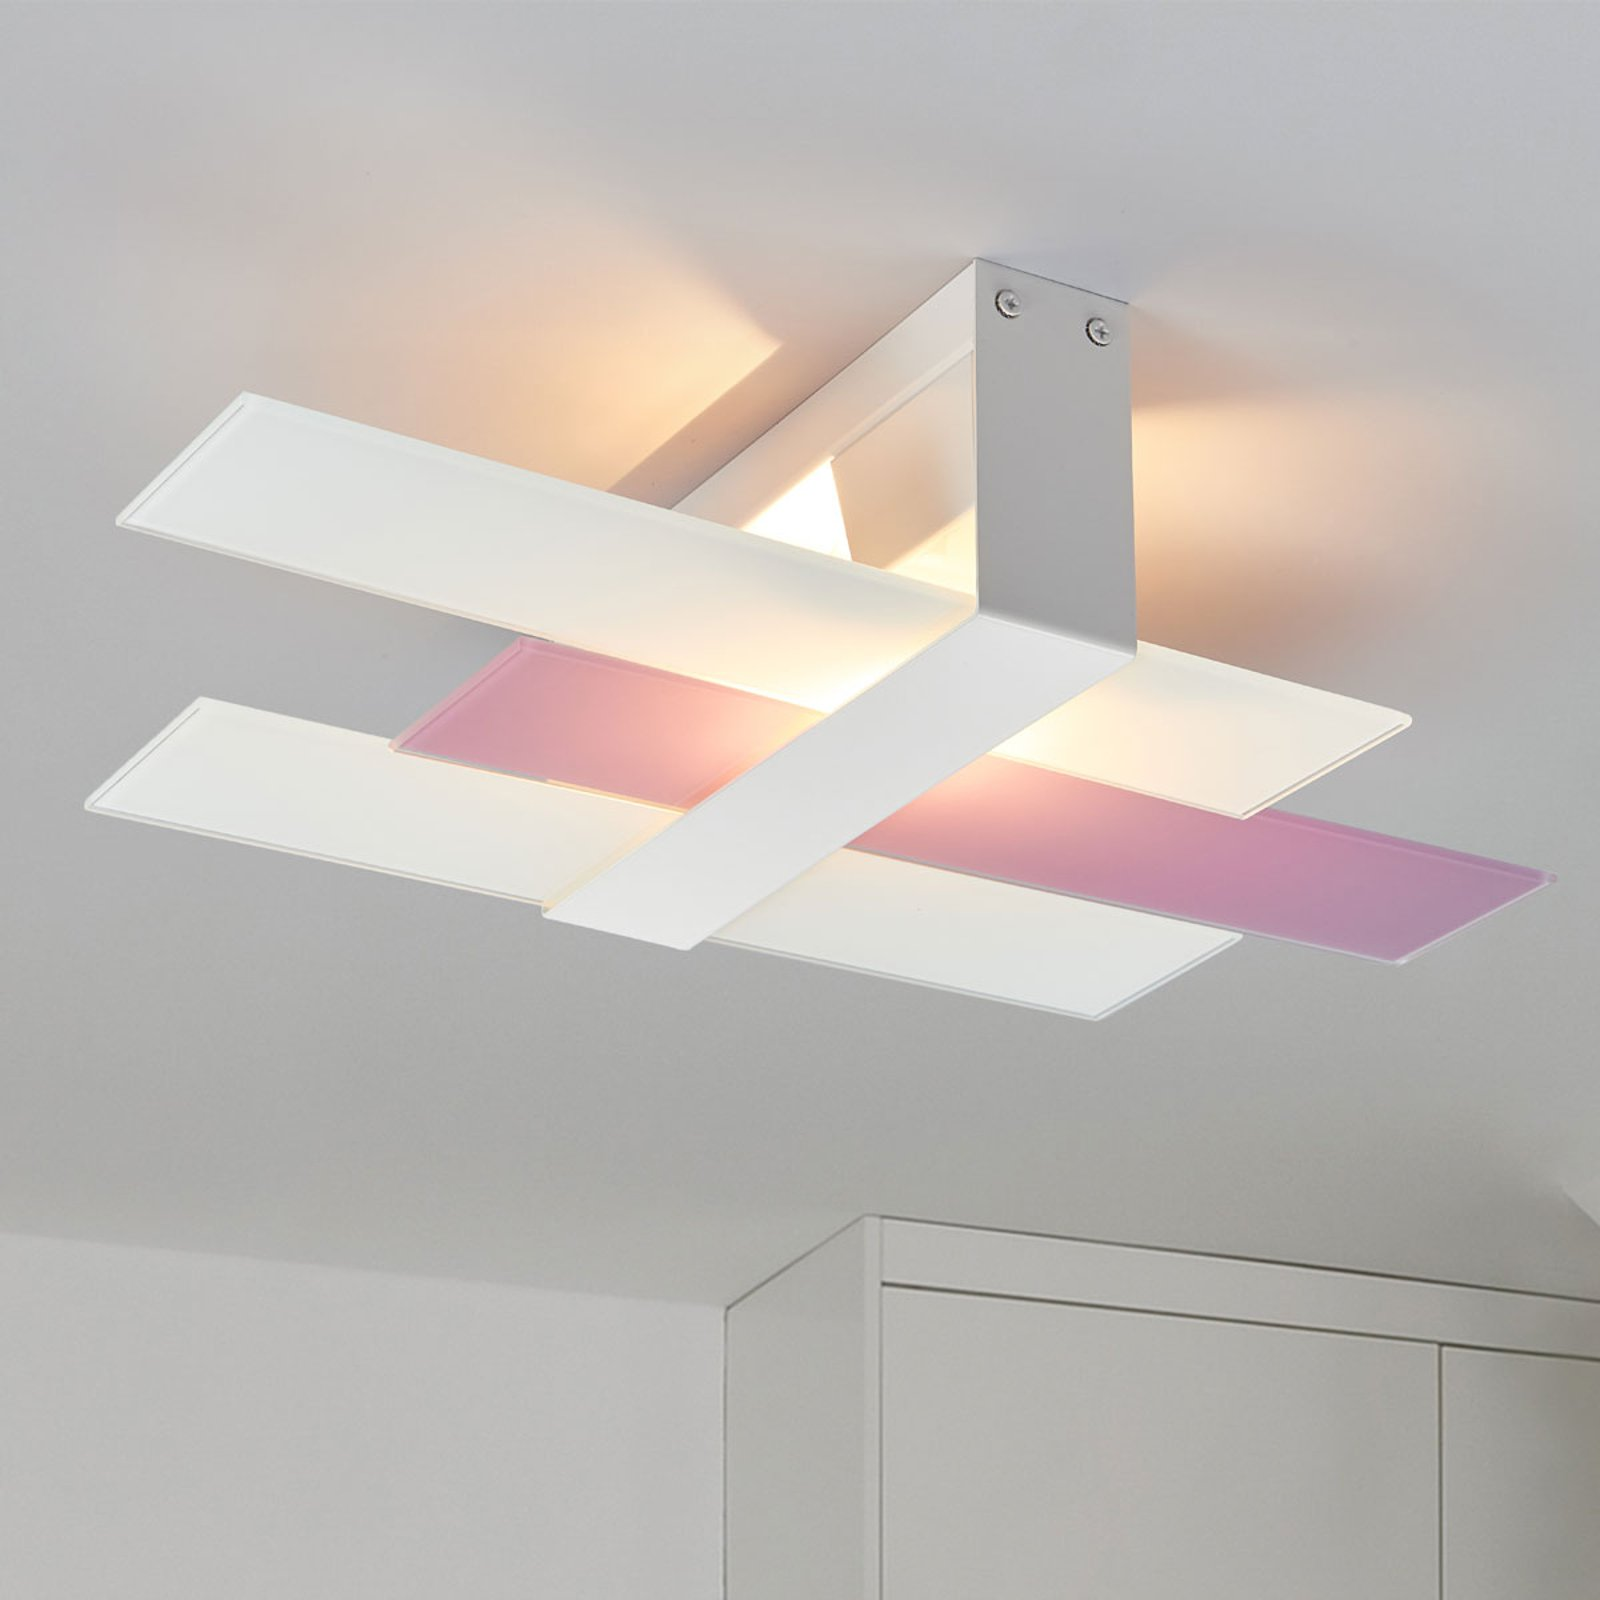 Moderne Triad taklampe i hvitt/lilla, 48 cm